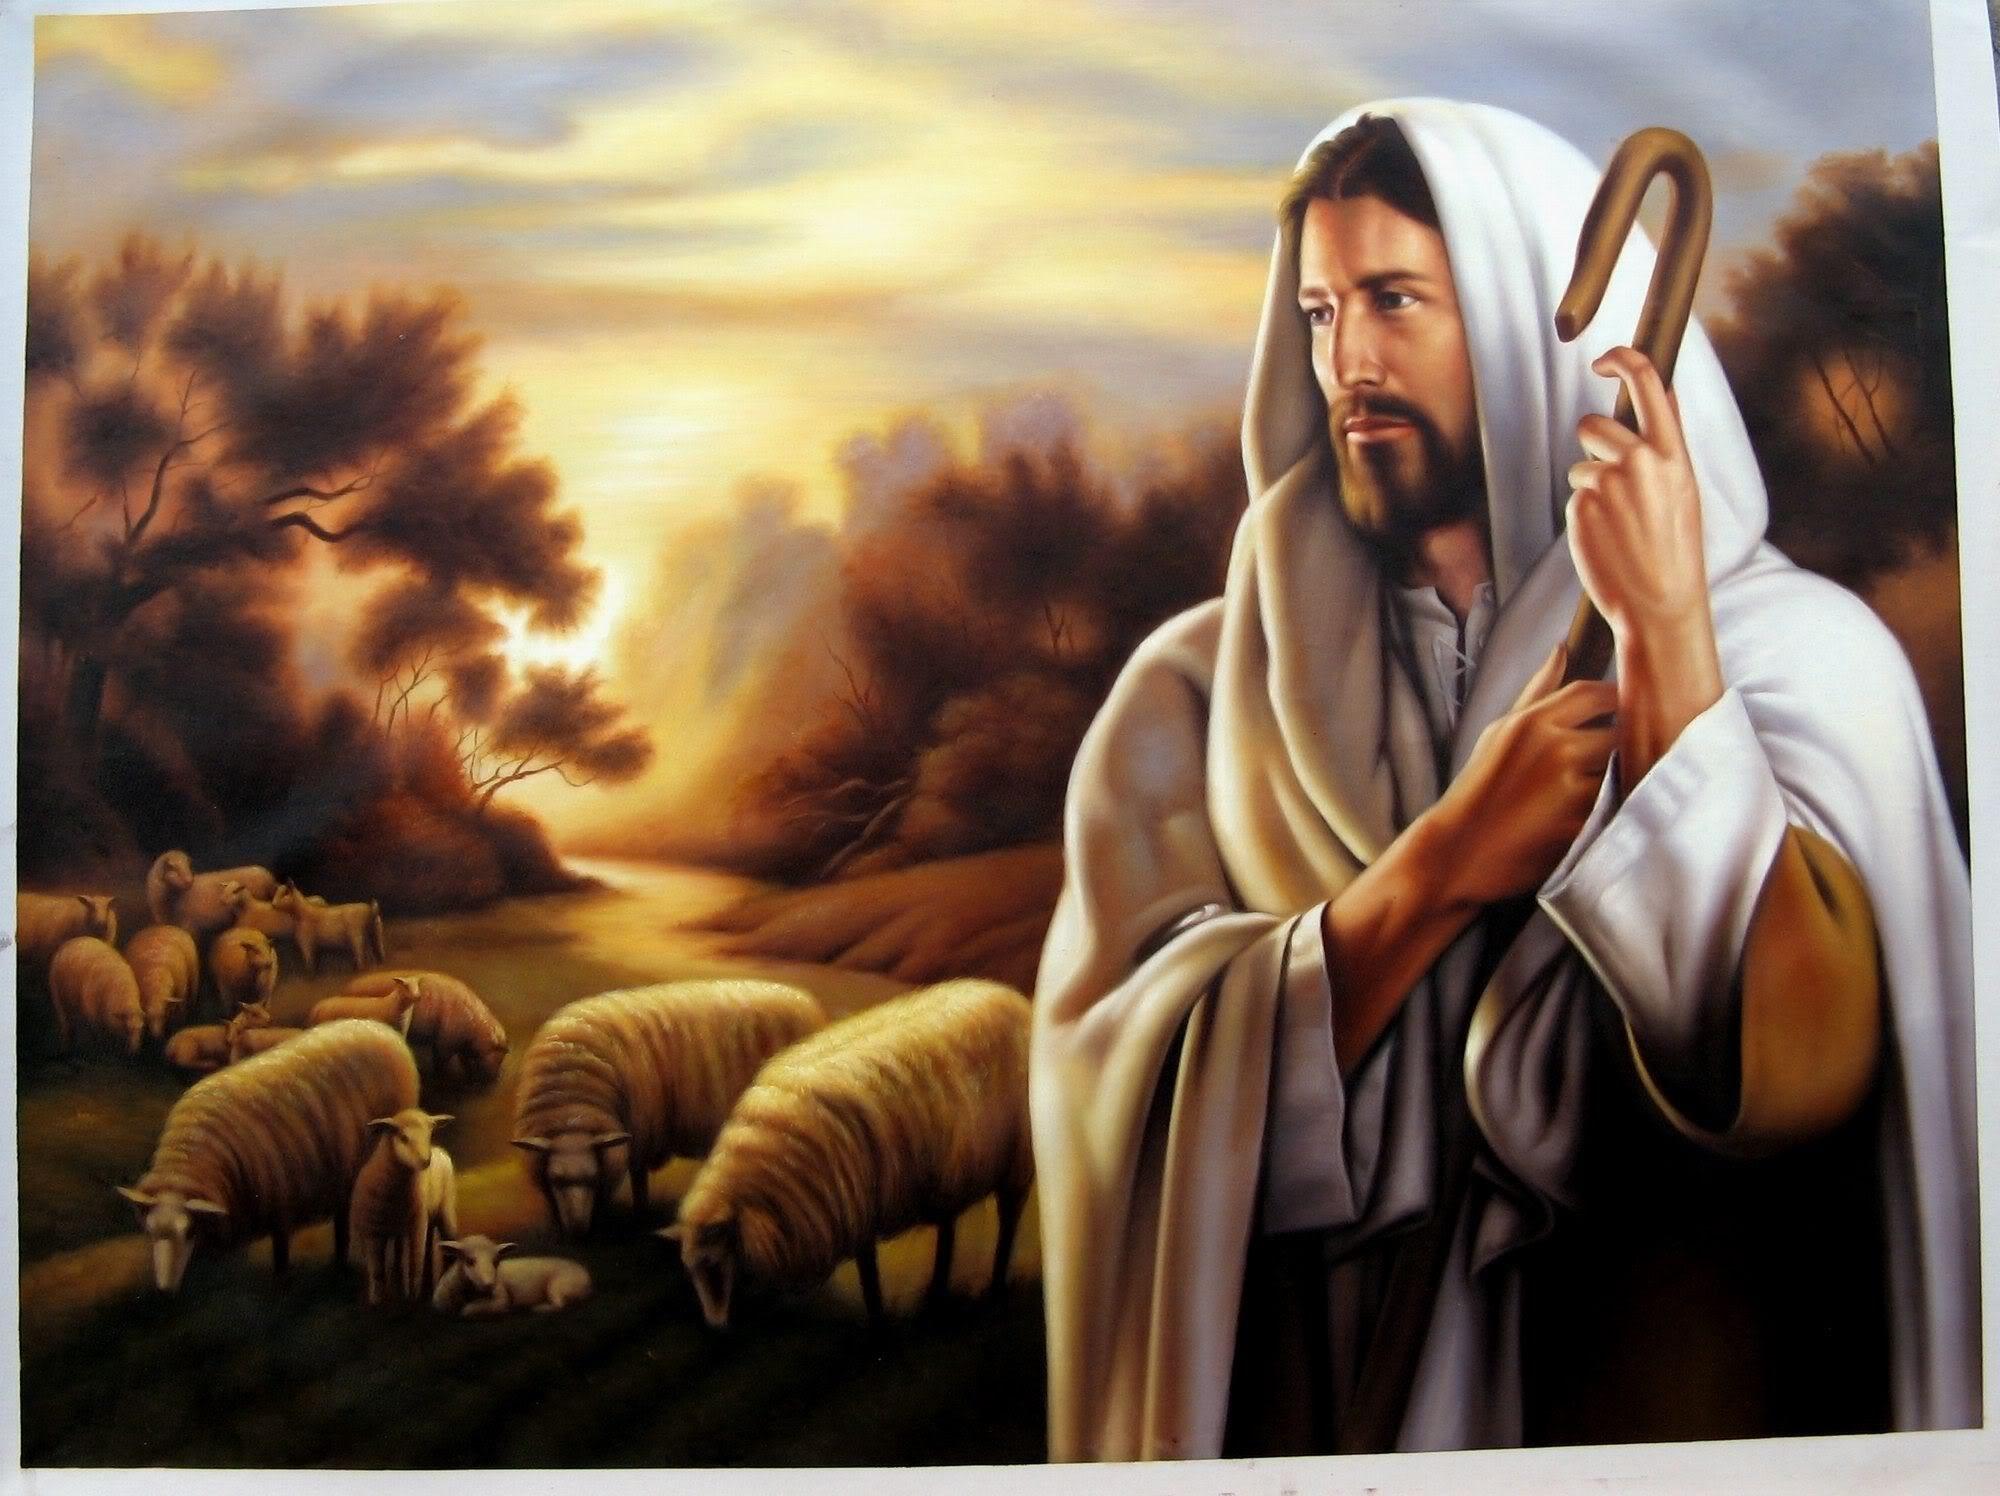 Title Jesus Wallpaper Hd Bdfjade Dimension 2000 X 1496 File Type JPG JPEG